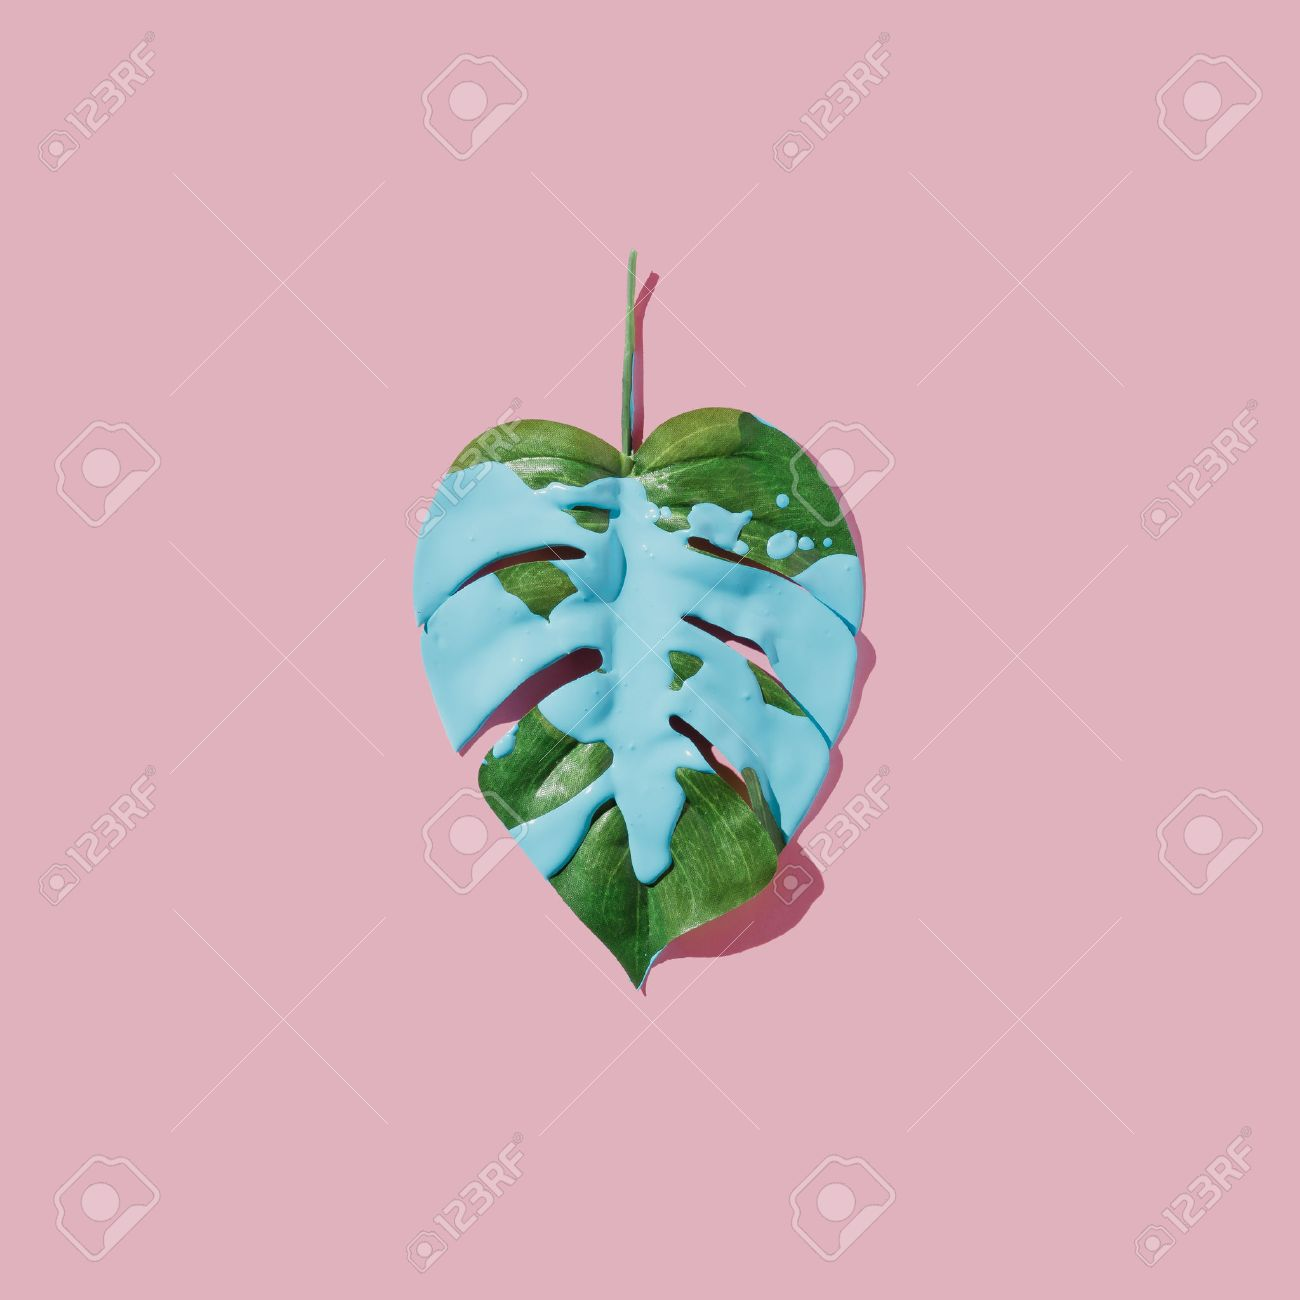 Blue paint splatter over tropical leaf on pink pastel background. flat lay. Minimal concept. - 82877724